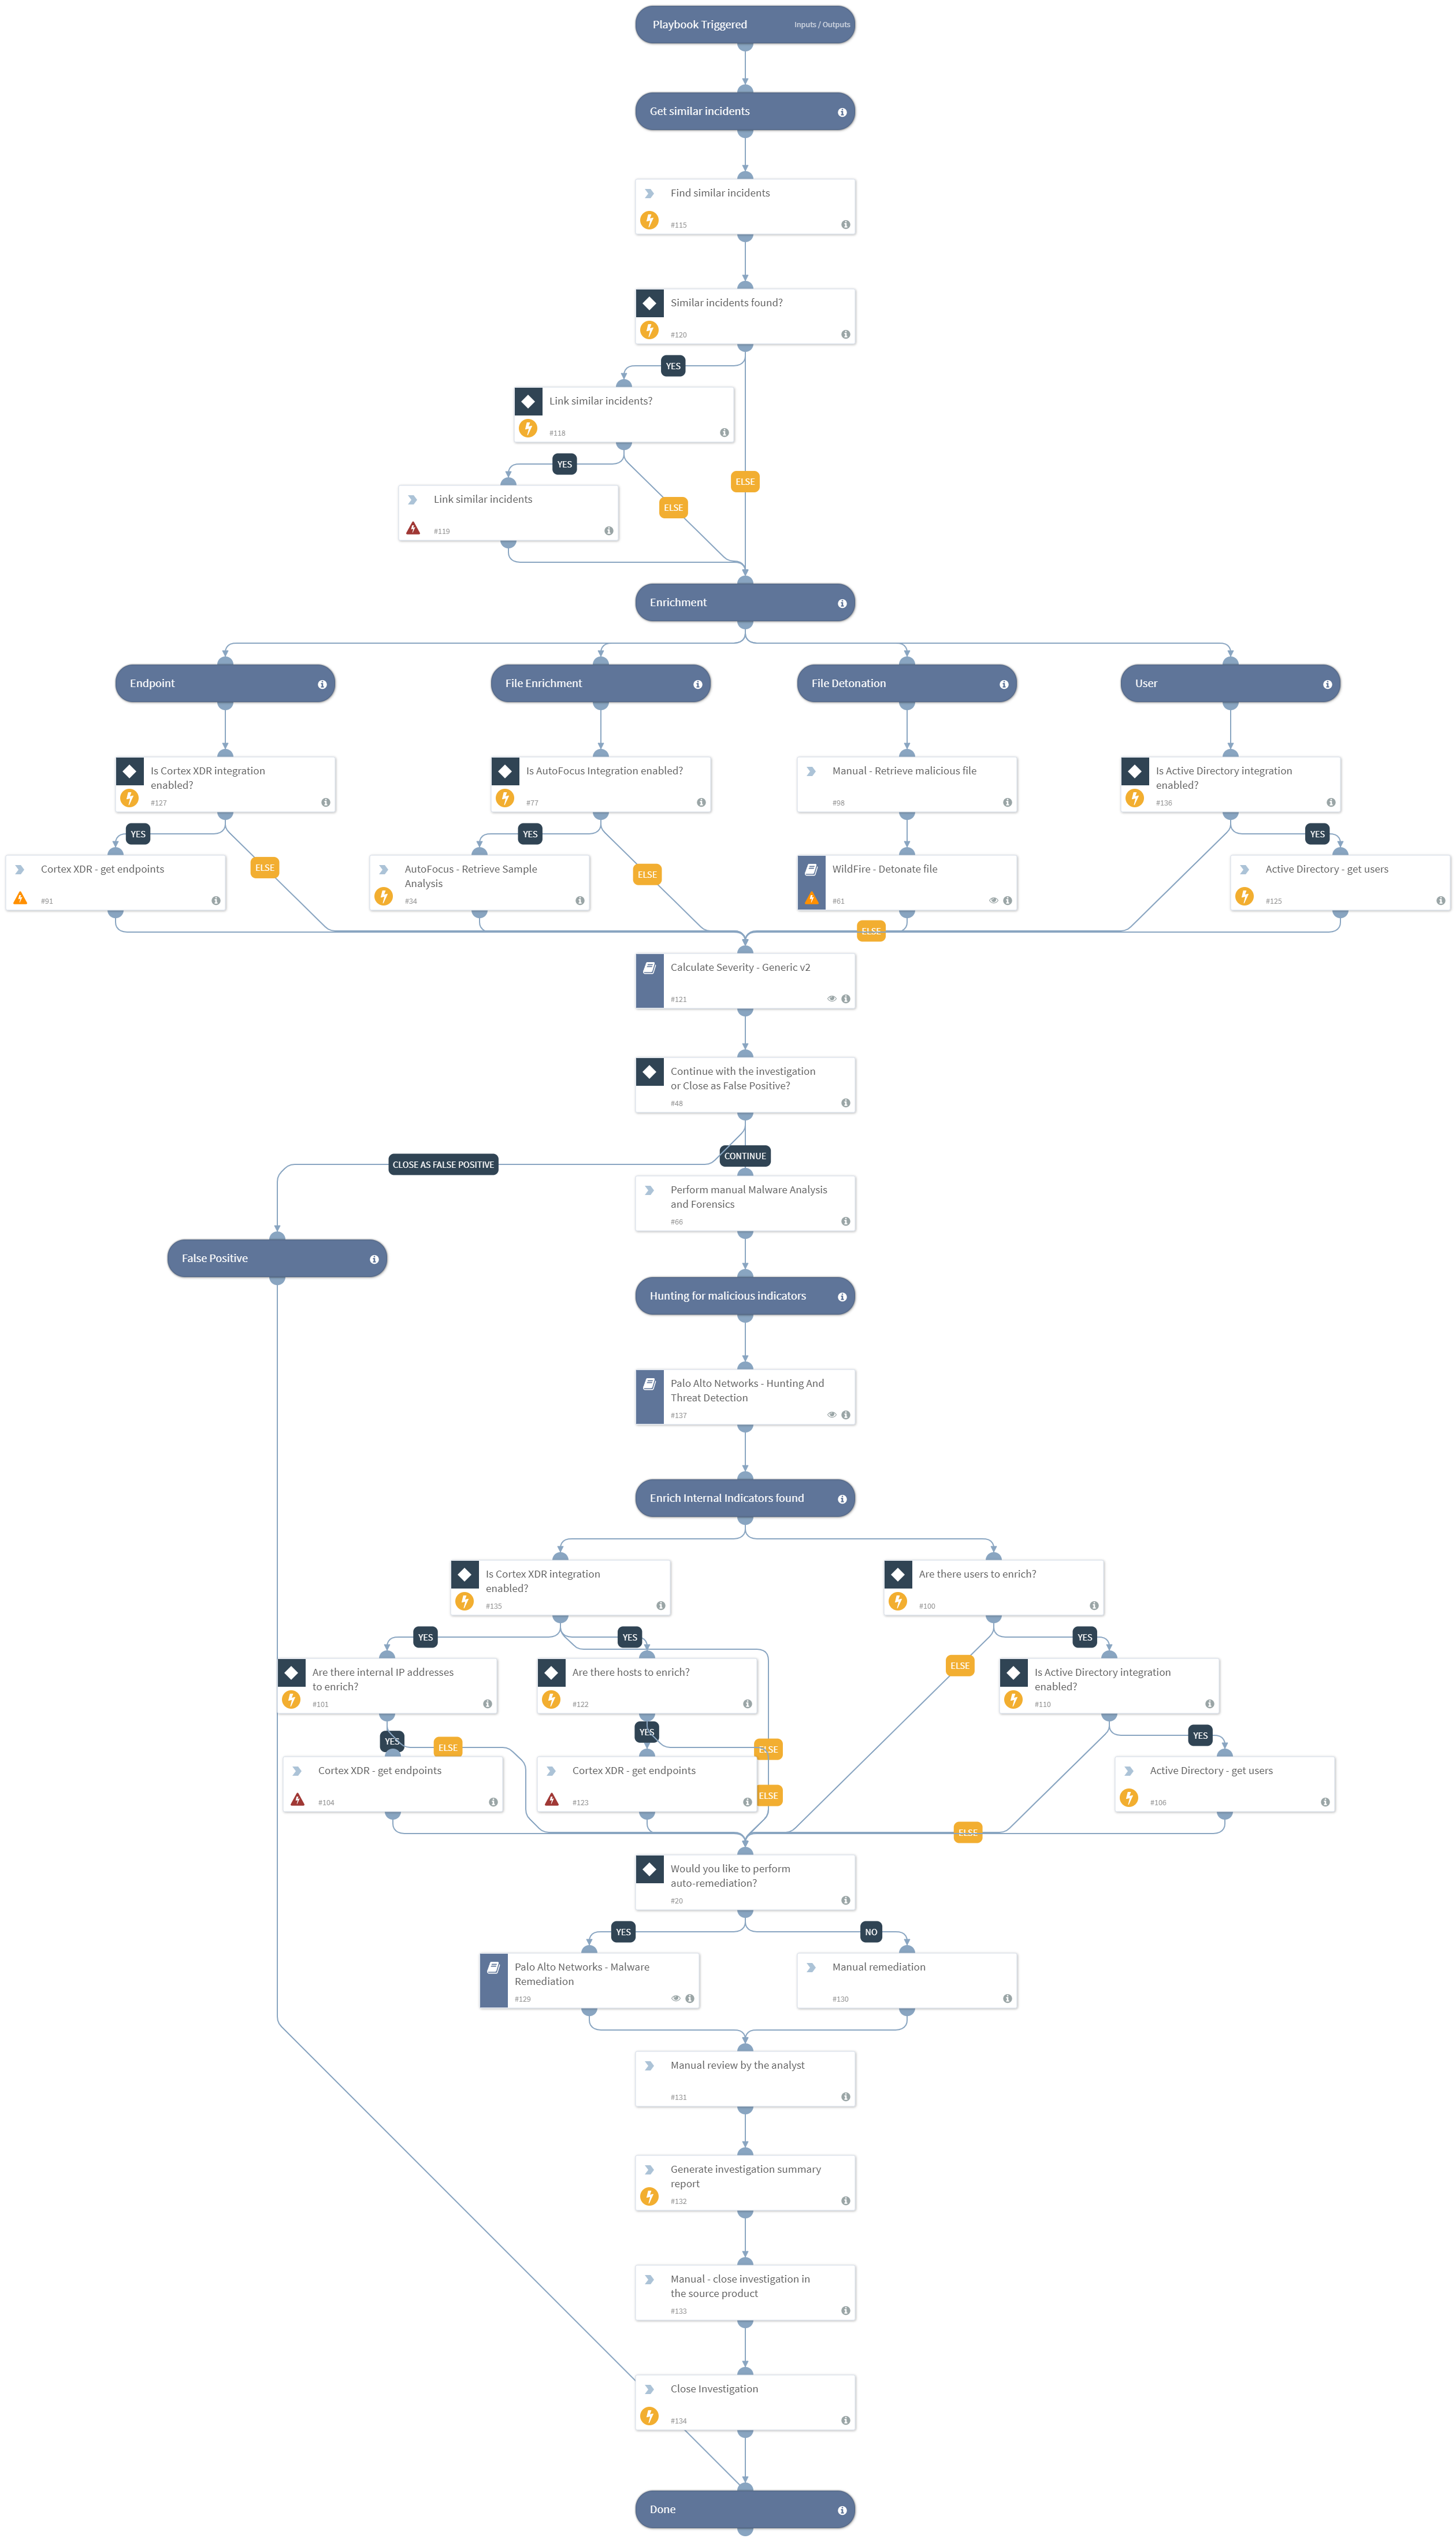 Palo Alto Networks - Endpoint Malware Investigation v3